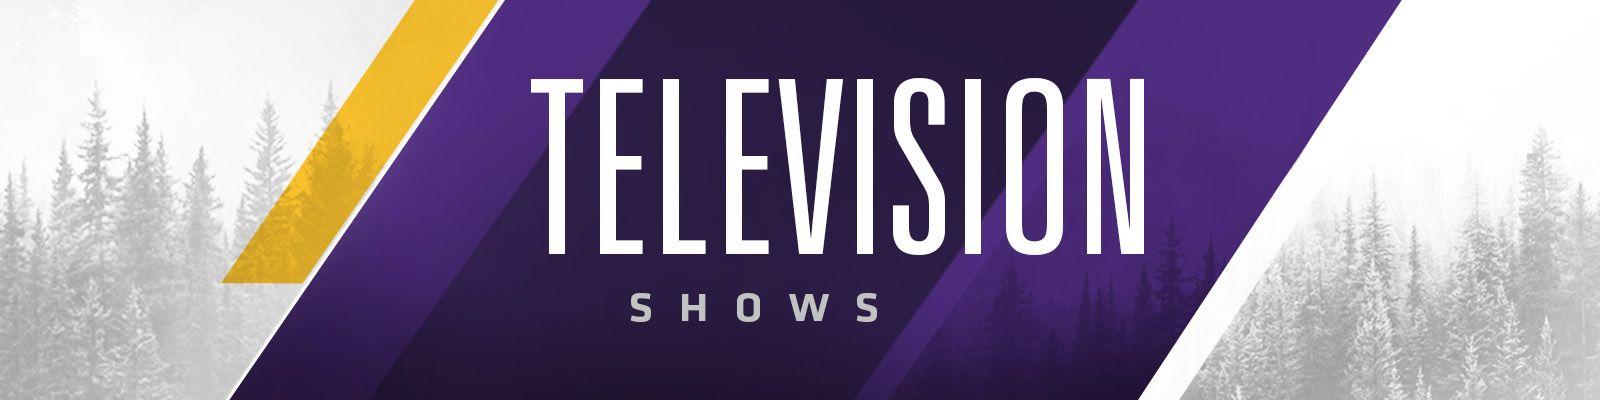 TVShows_1600x400